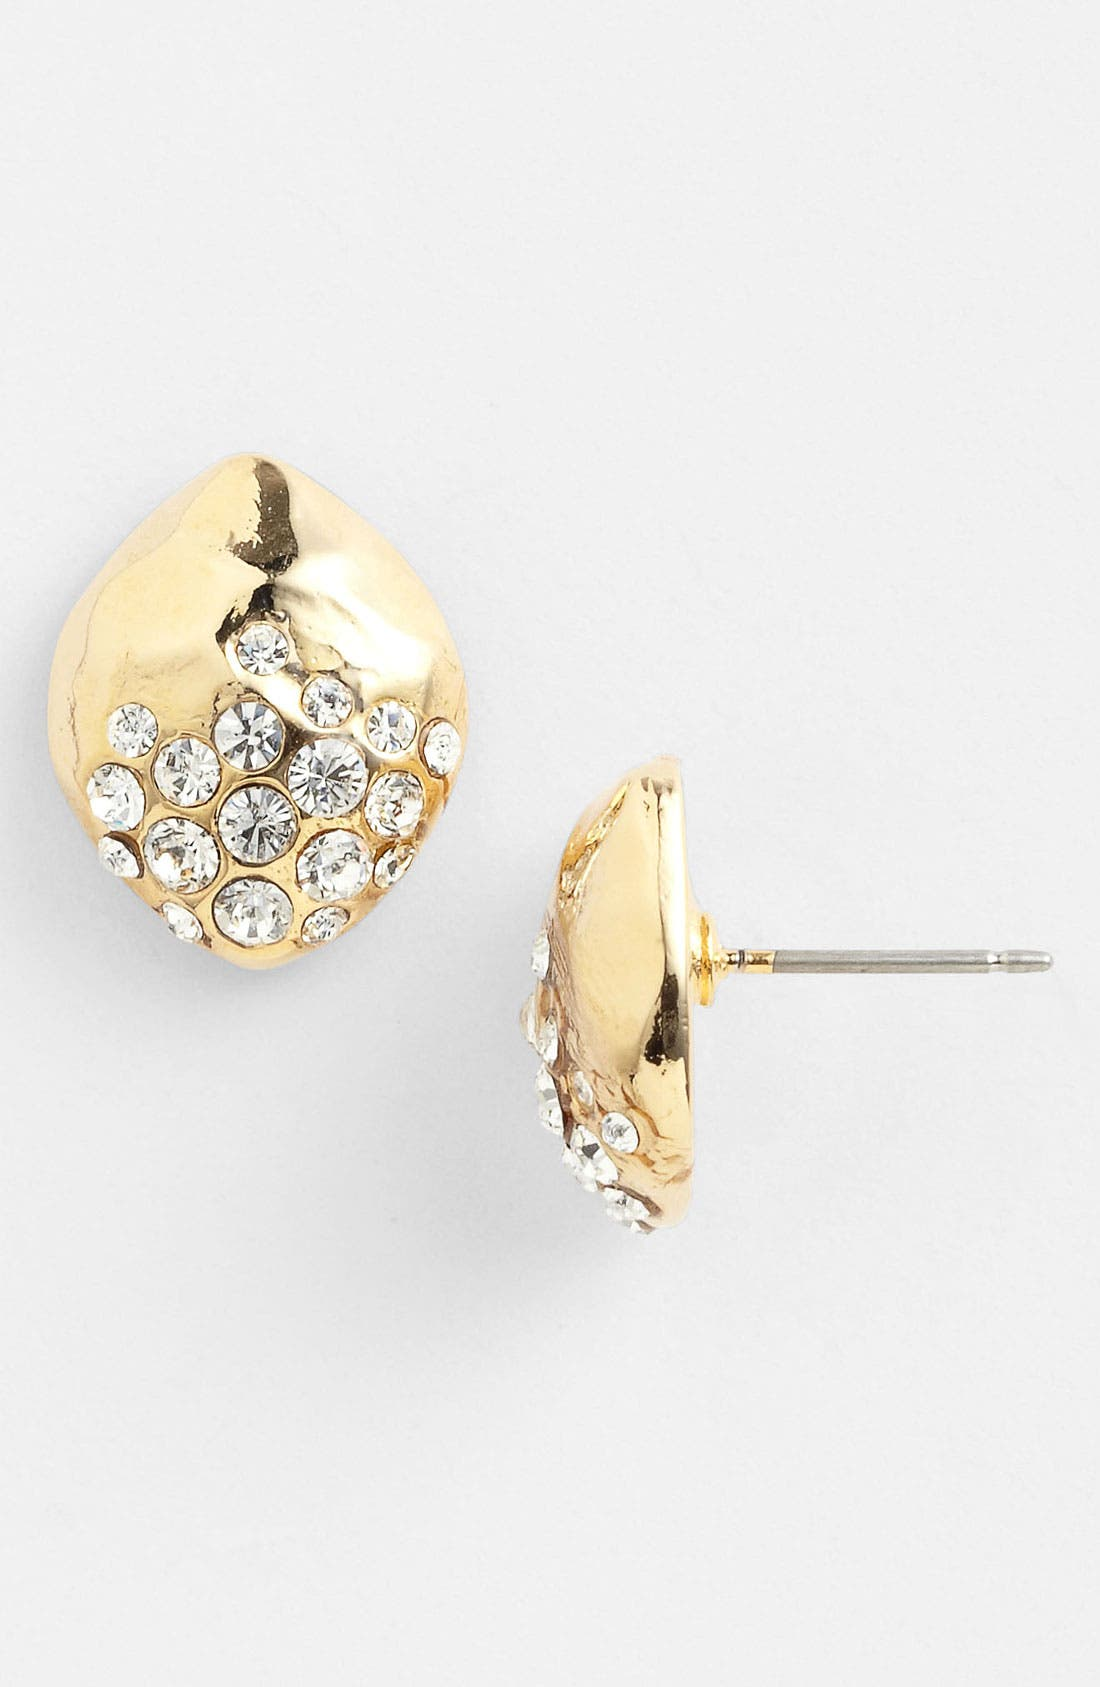 Main Image - Nordstrom 'Sand Dollar' Stud Earrings